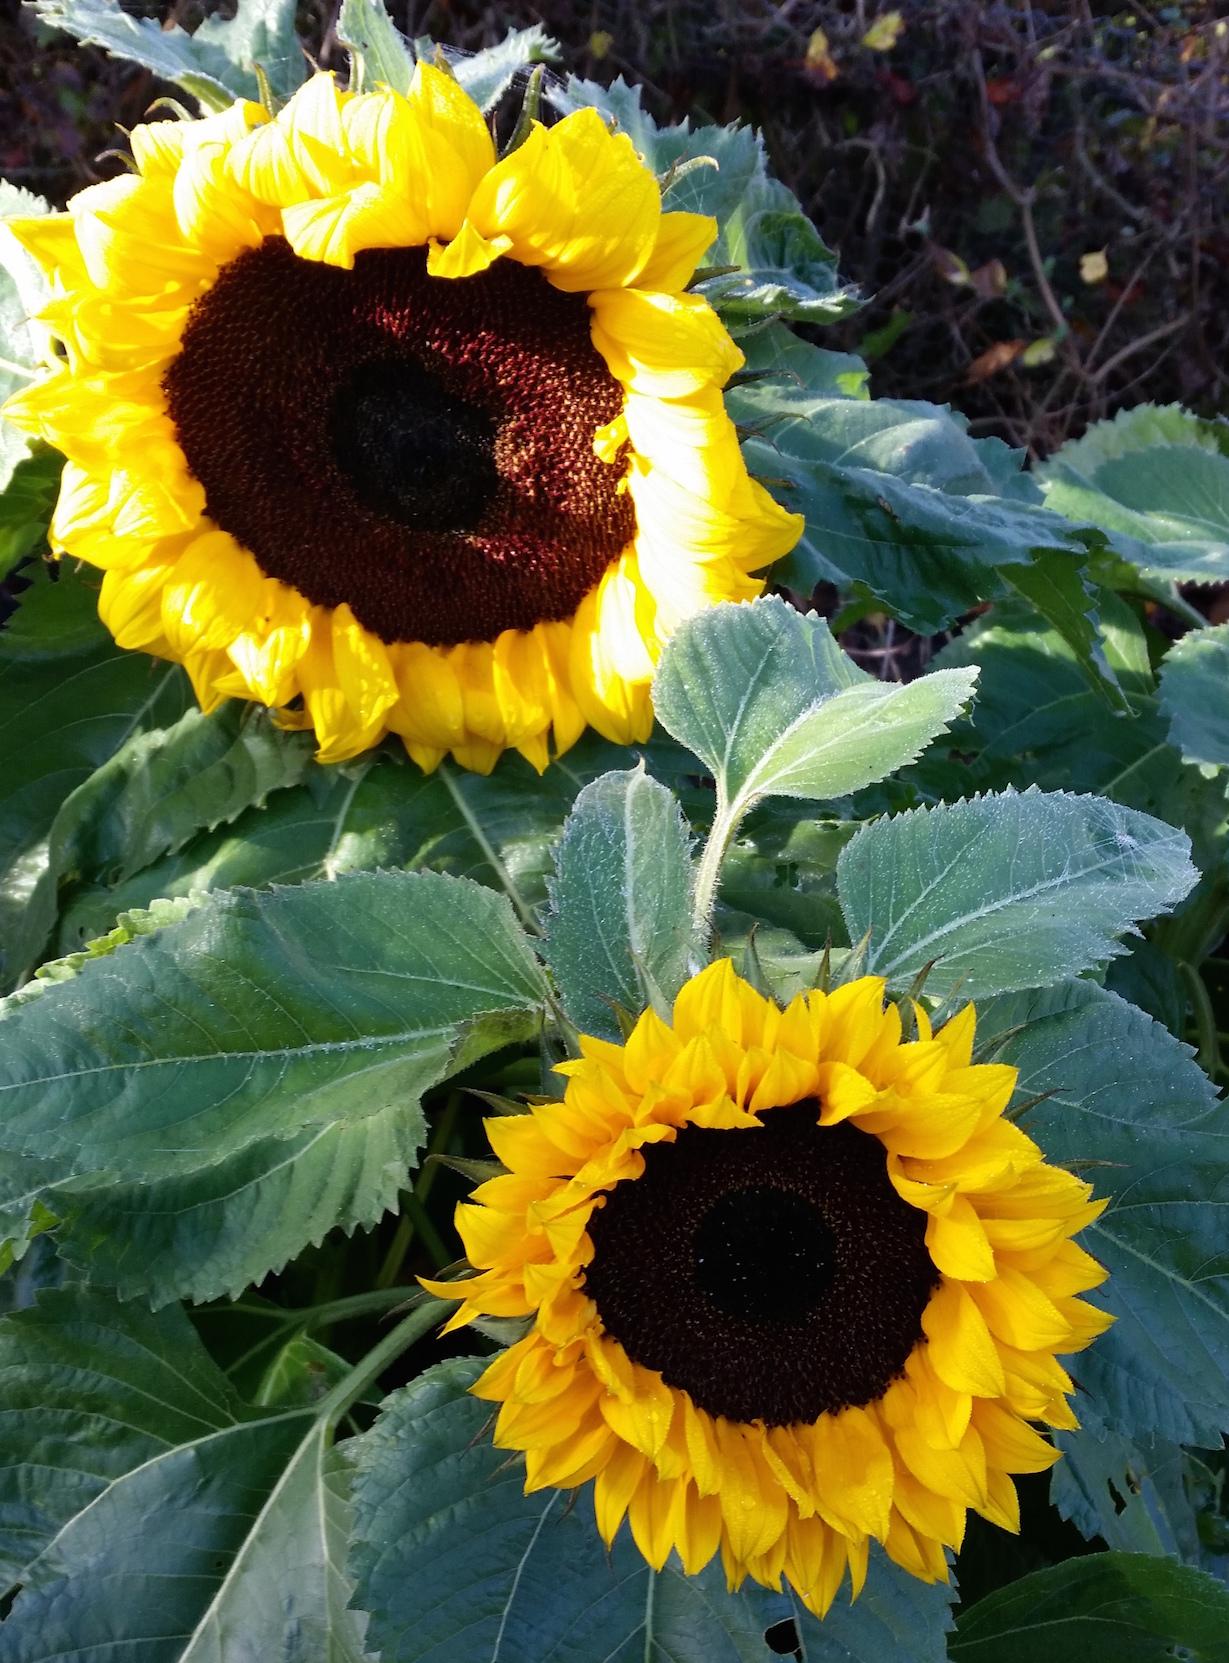 gallery-autumn-sunflower.jpg